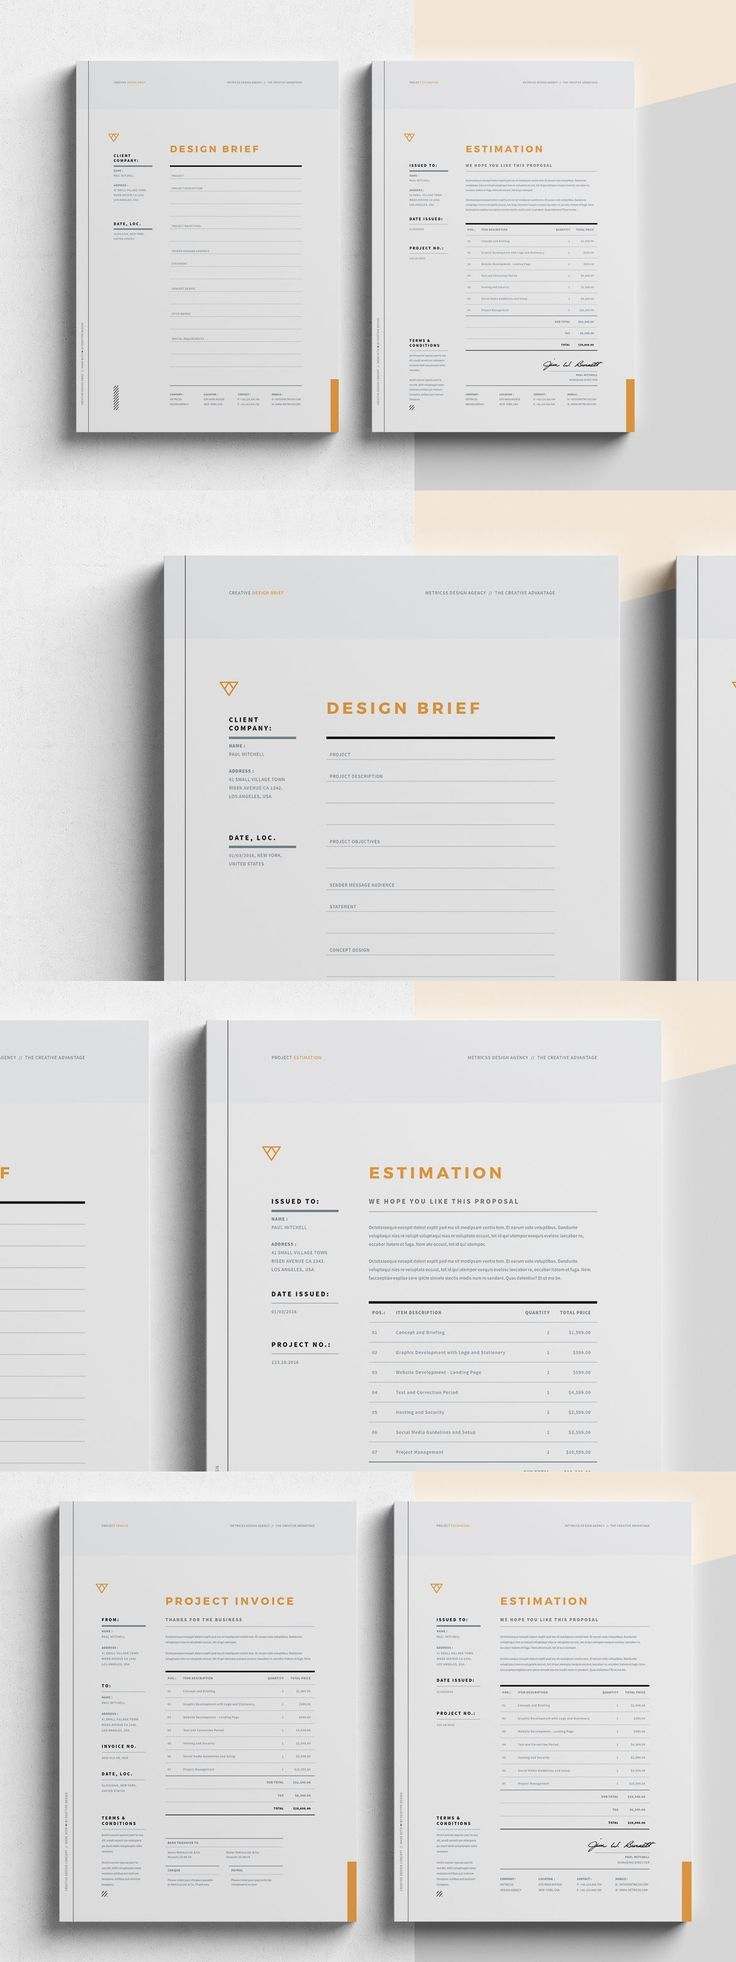 Brief - Estimation - Invoice Templates InDesign INDD | Design ...